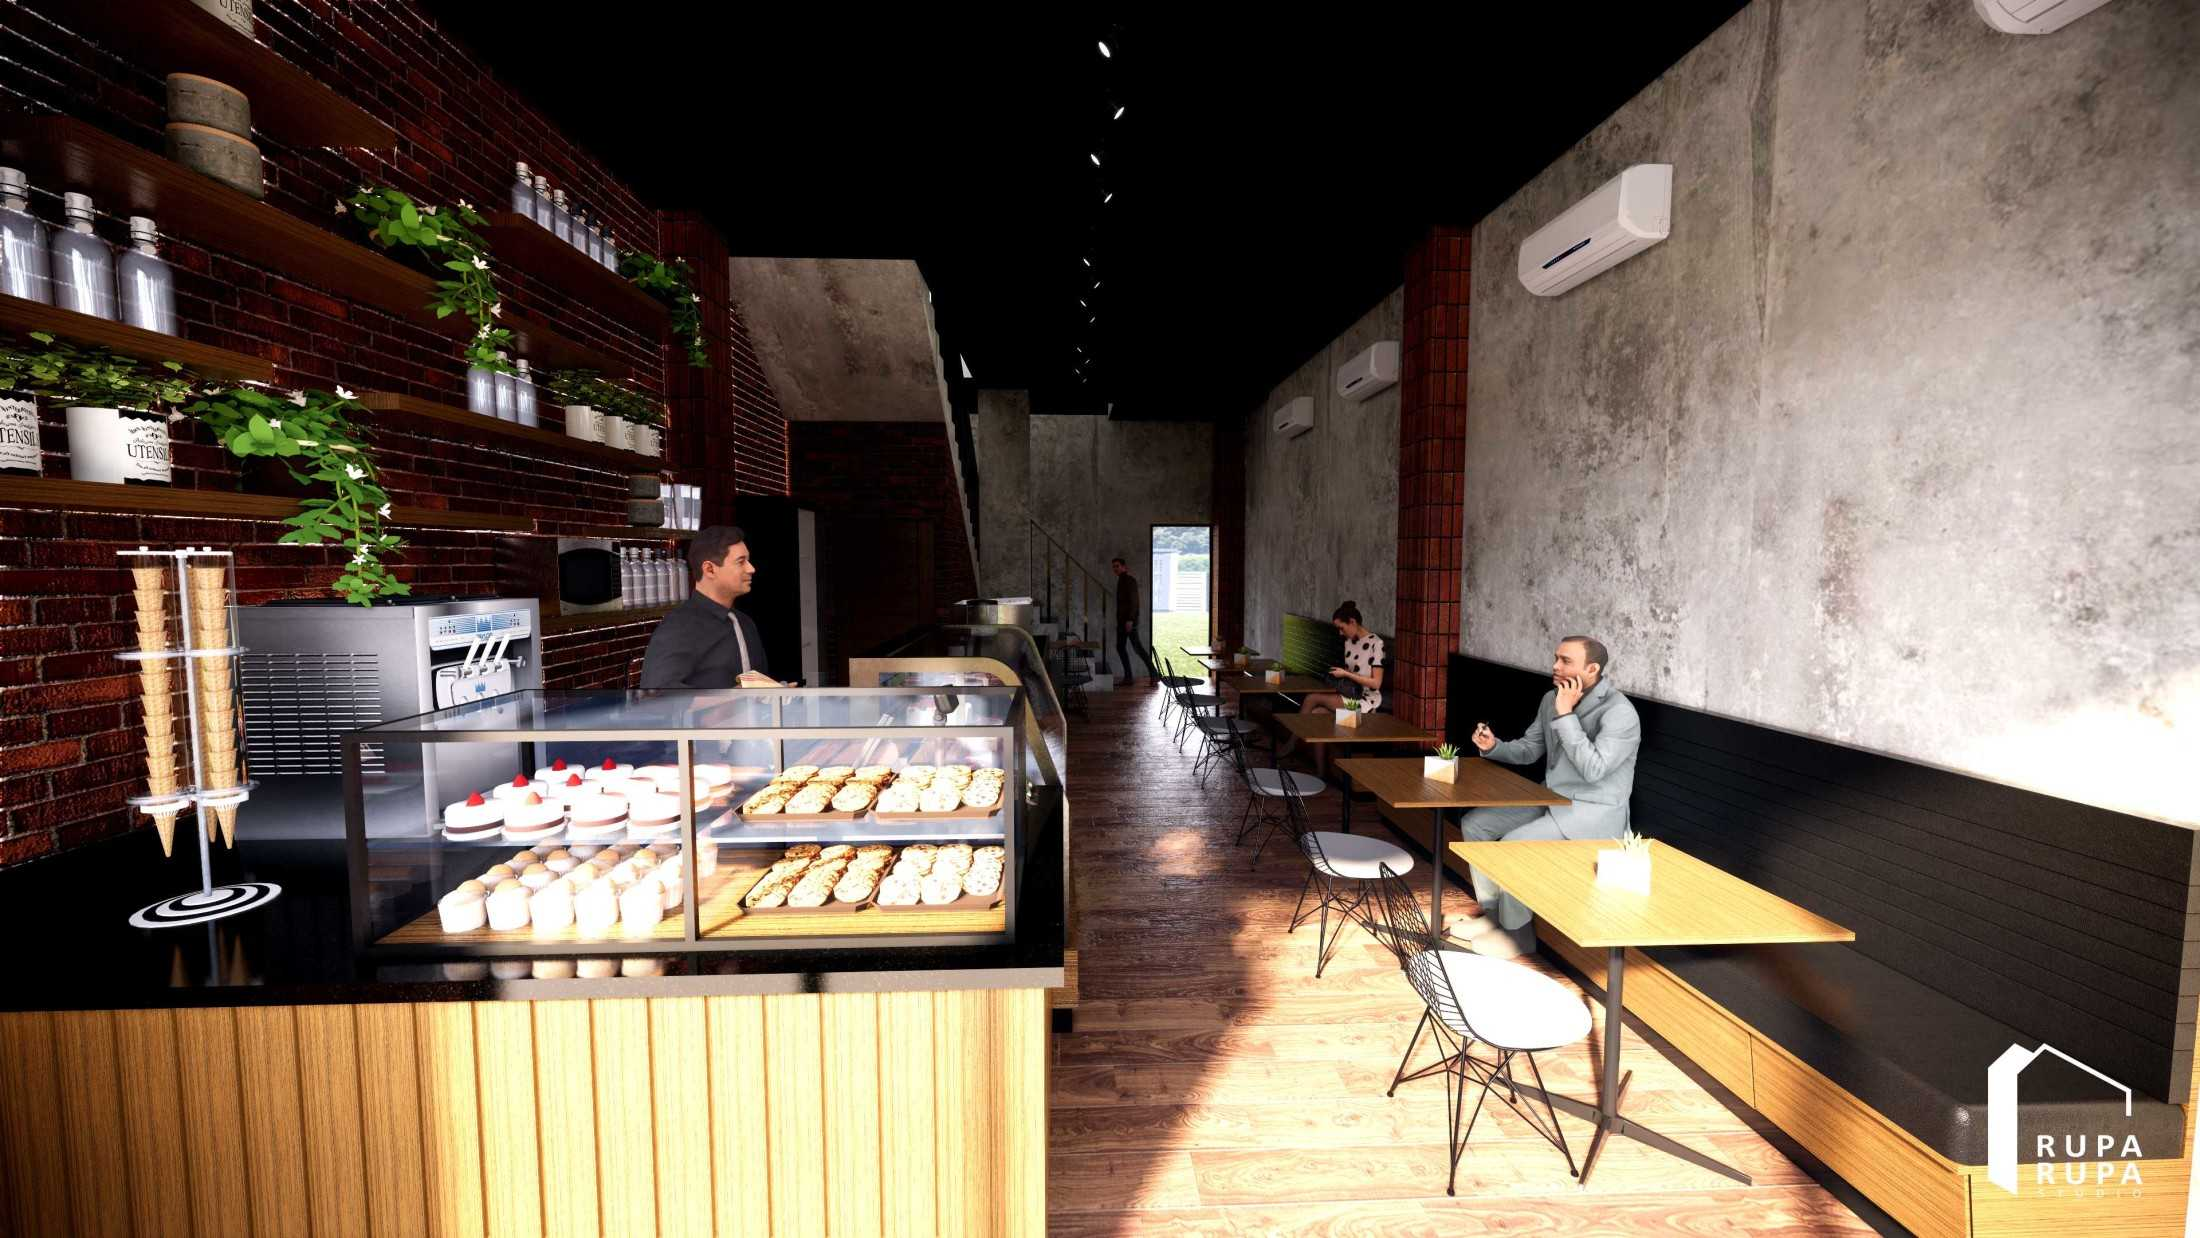 Studio Rupa Rupa Drupadi Corner Cafe Bali, Indonesia Bali, Indonesia Studio-Rupa-Rupa-Drupadi-Corner-Cafe  88066